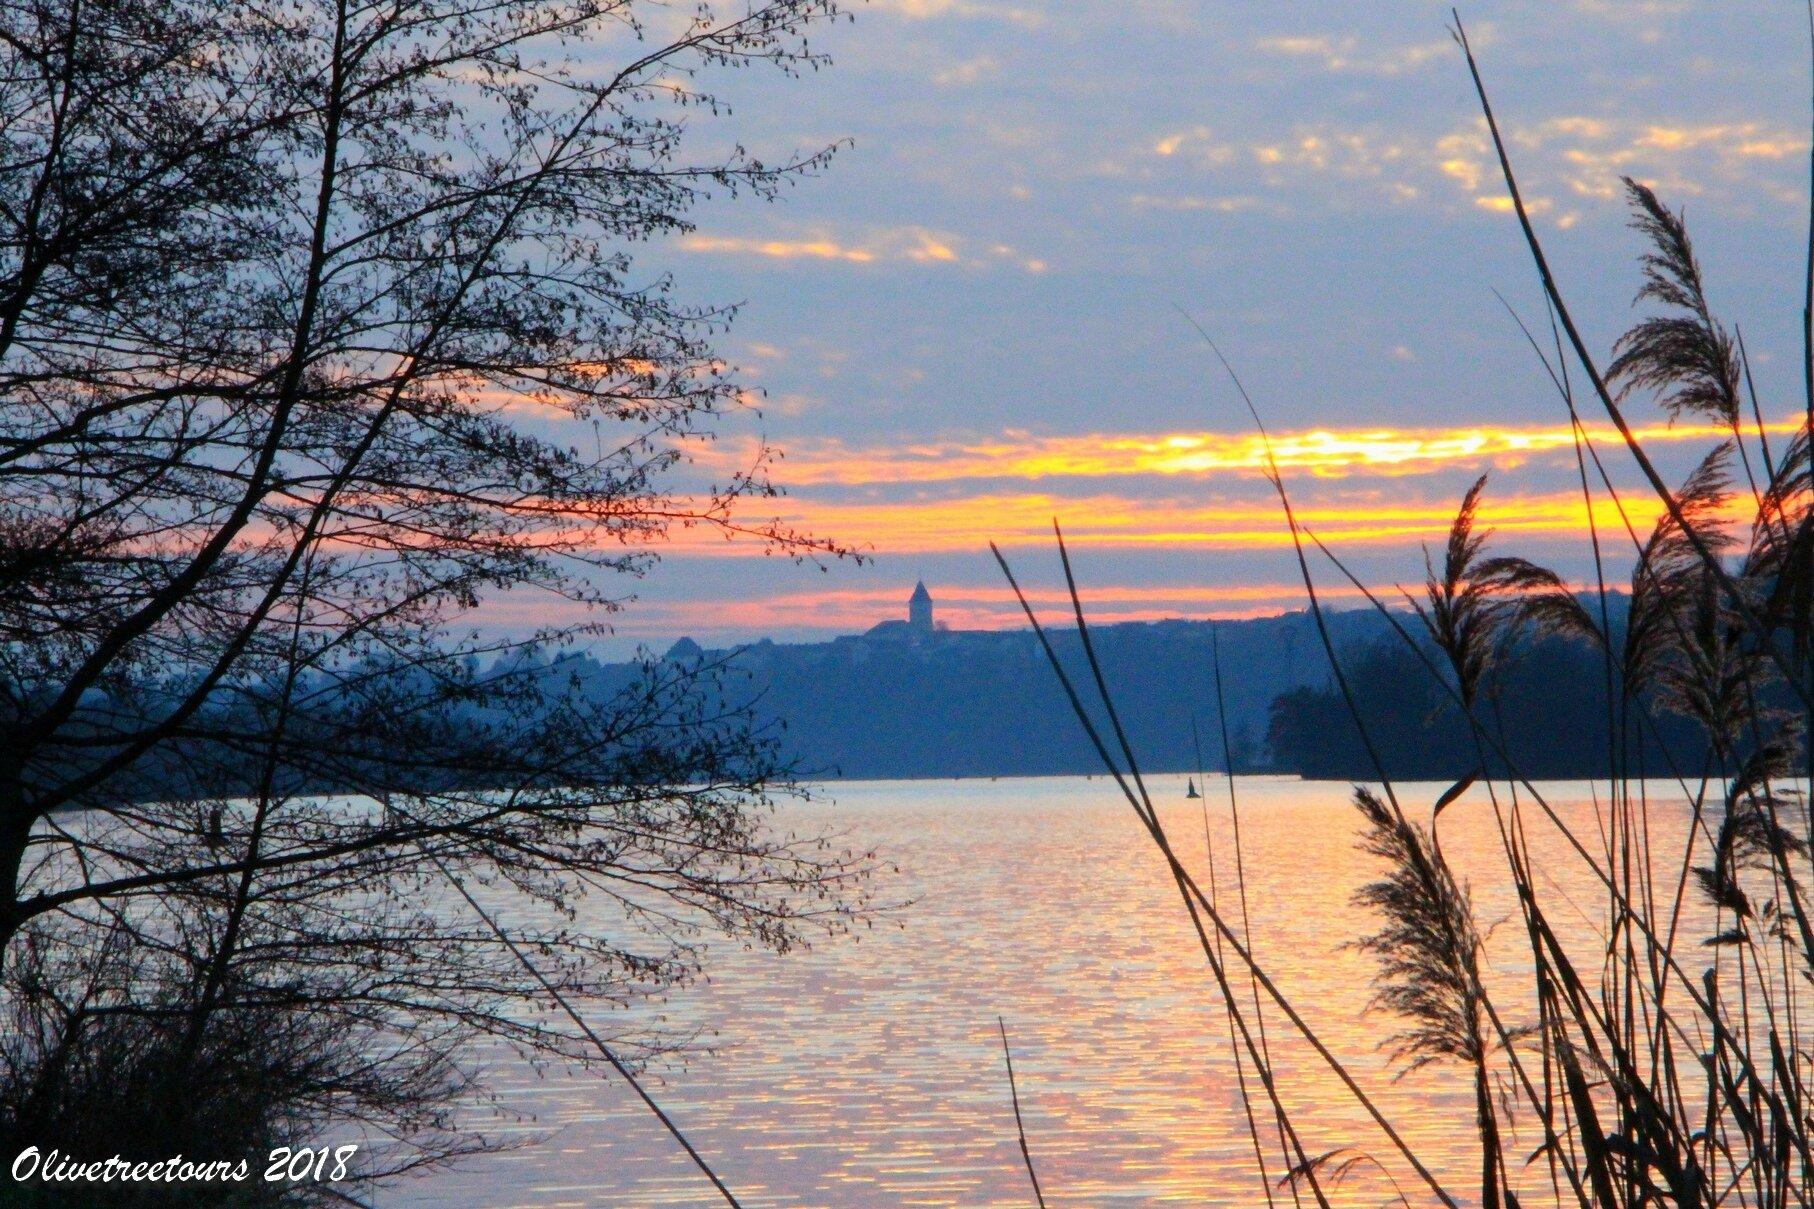 Un coucher de soleil hivernal / A winter sunset